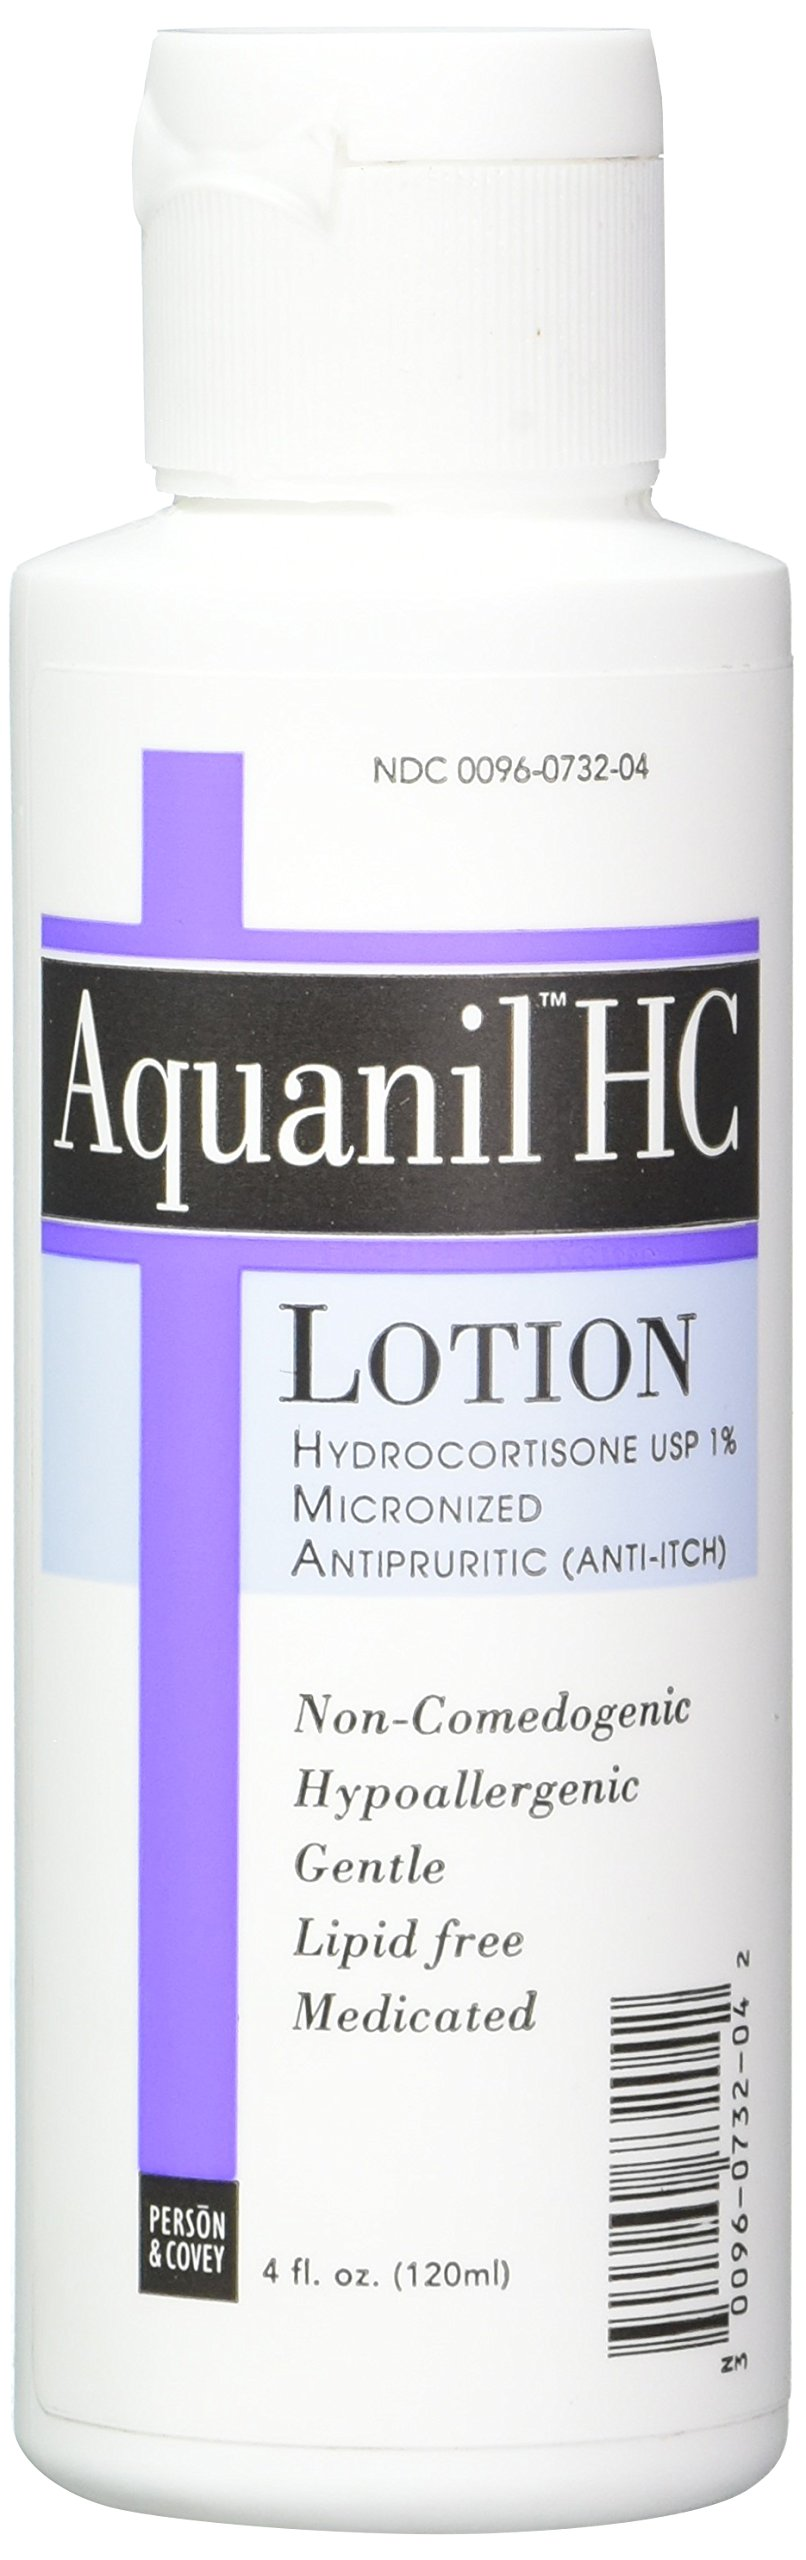 Aquanil Hc Lotion 4 Oz (Pack of 2)